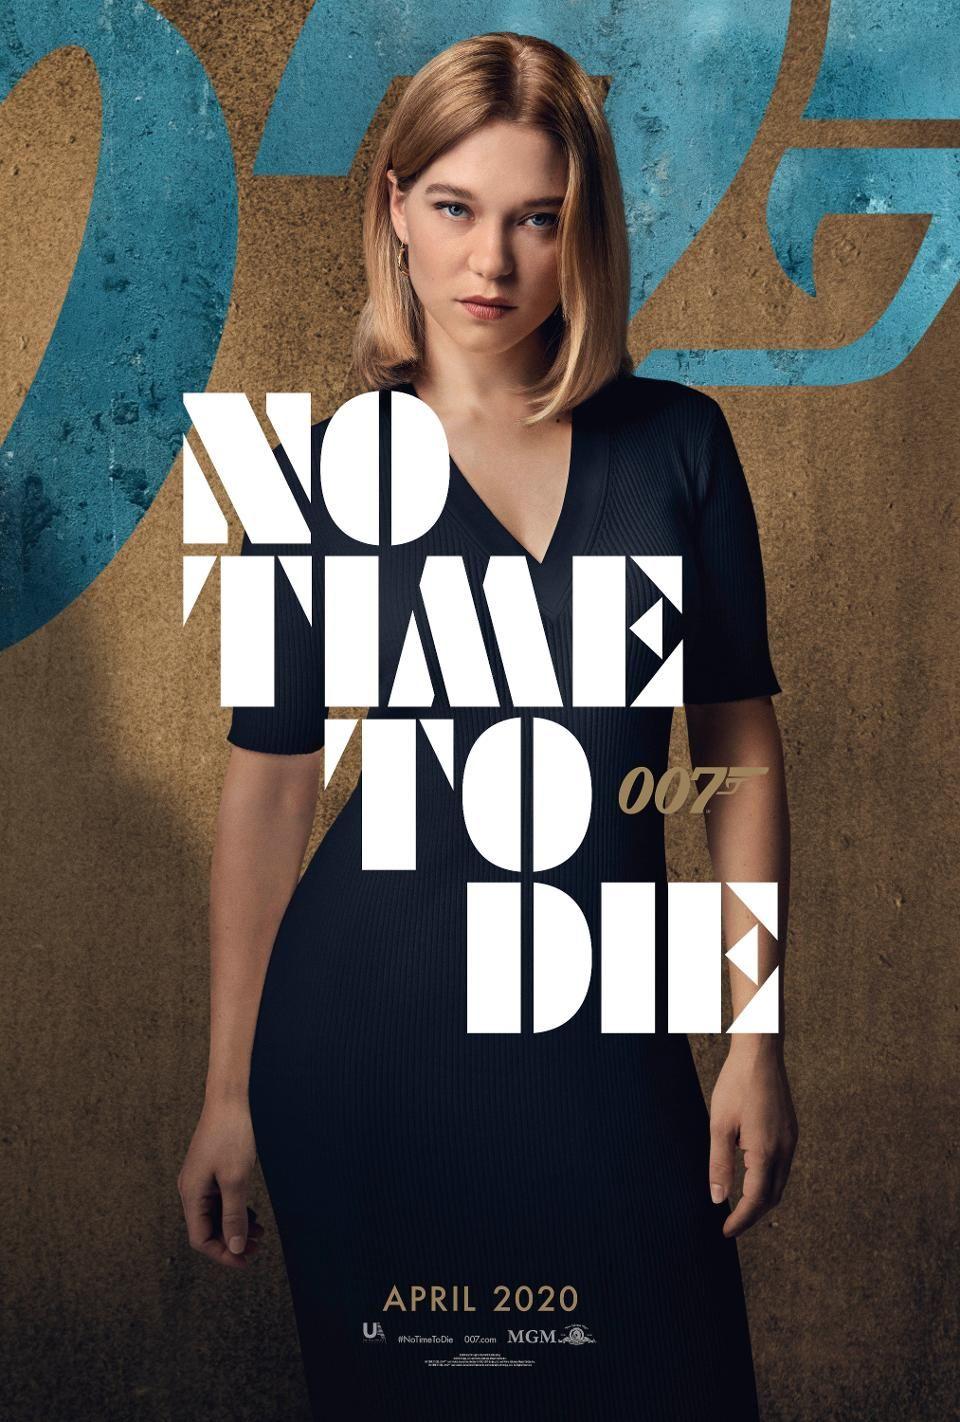 No Time To Die Posters The Next James Bond Movie Has One Big Advantage Over Spectre Bond Movies James Bond Movies Latest James Bond Movie